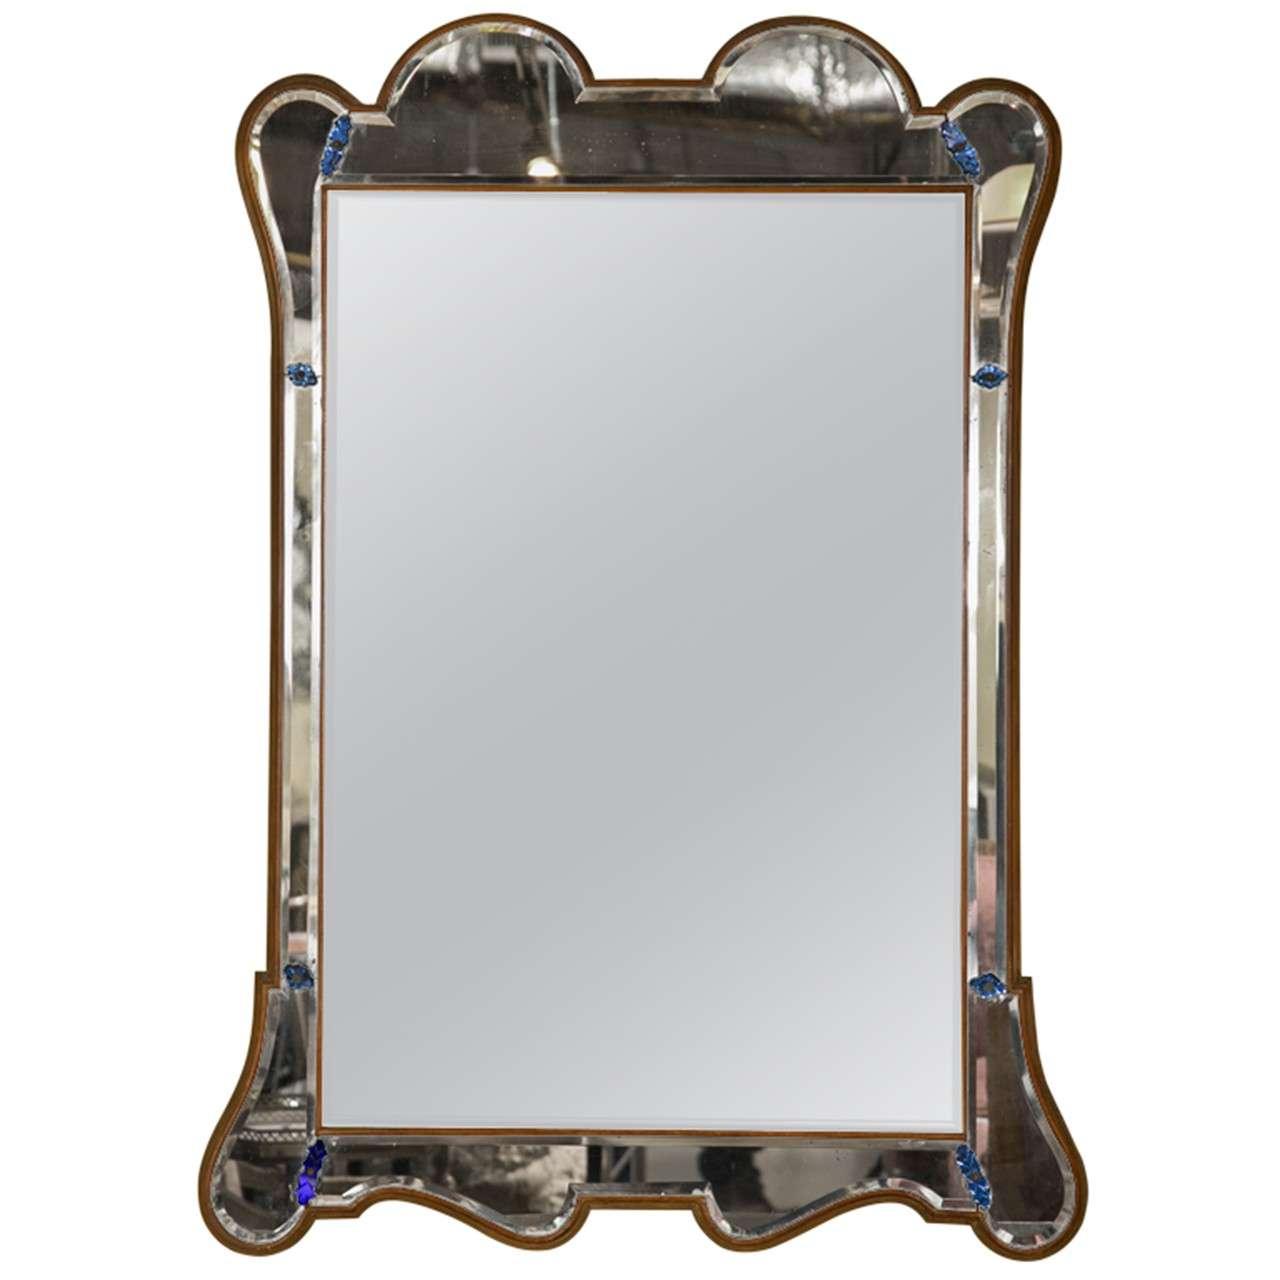 Elegant hollywood regency style mirror at 1stdibs for Elegant mirrors